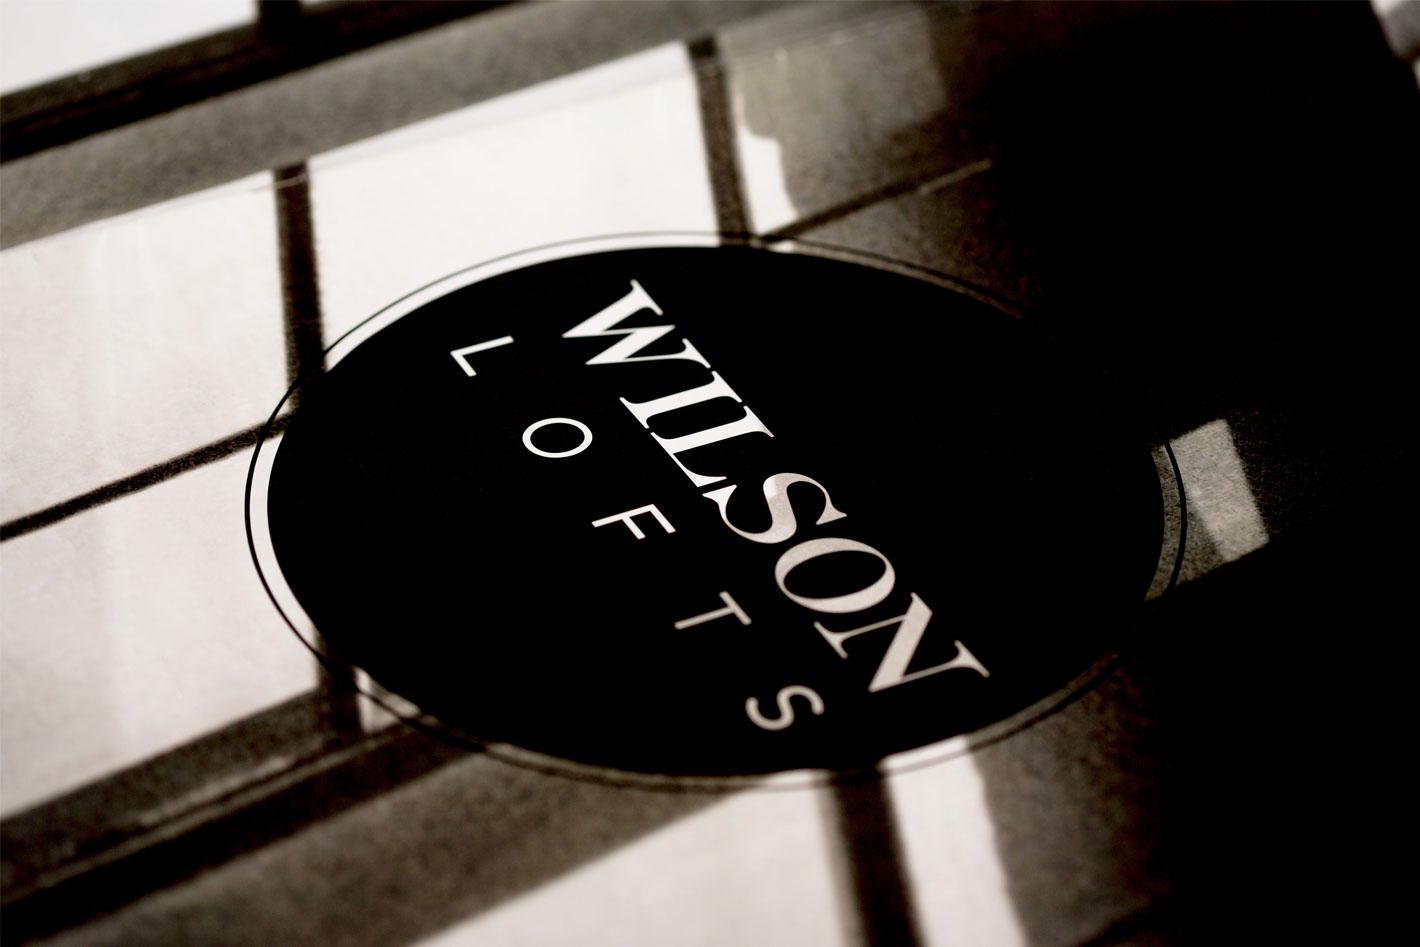 Wilson_IMGS_1420x947portefolio-0539